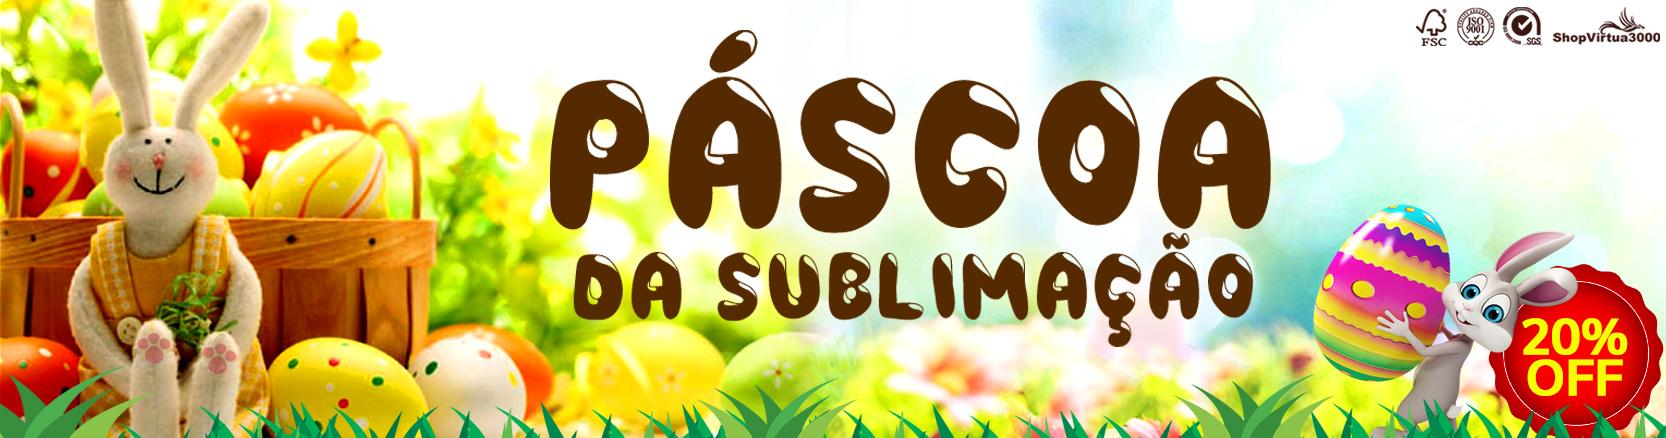 PASCOA 2020